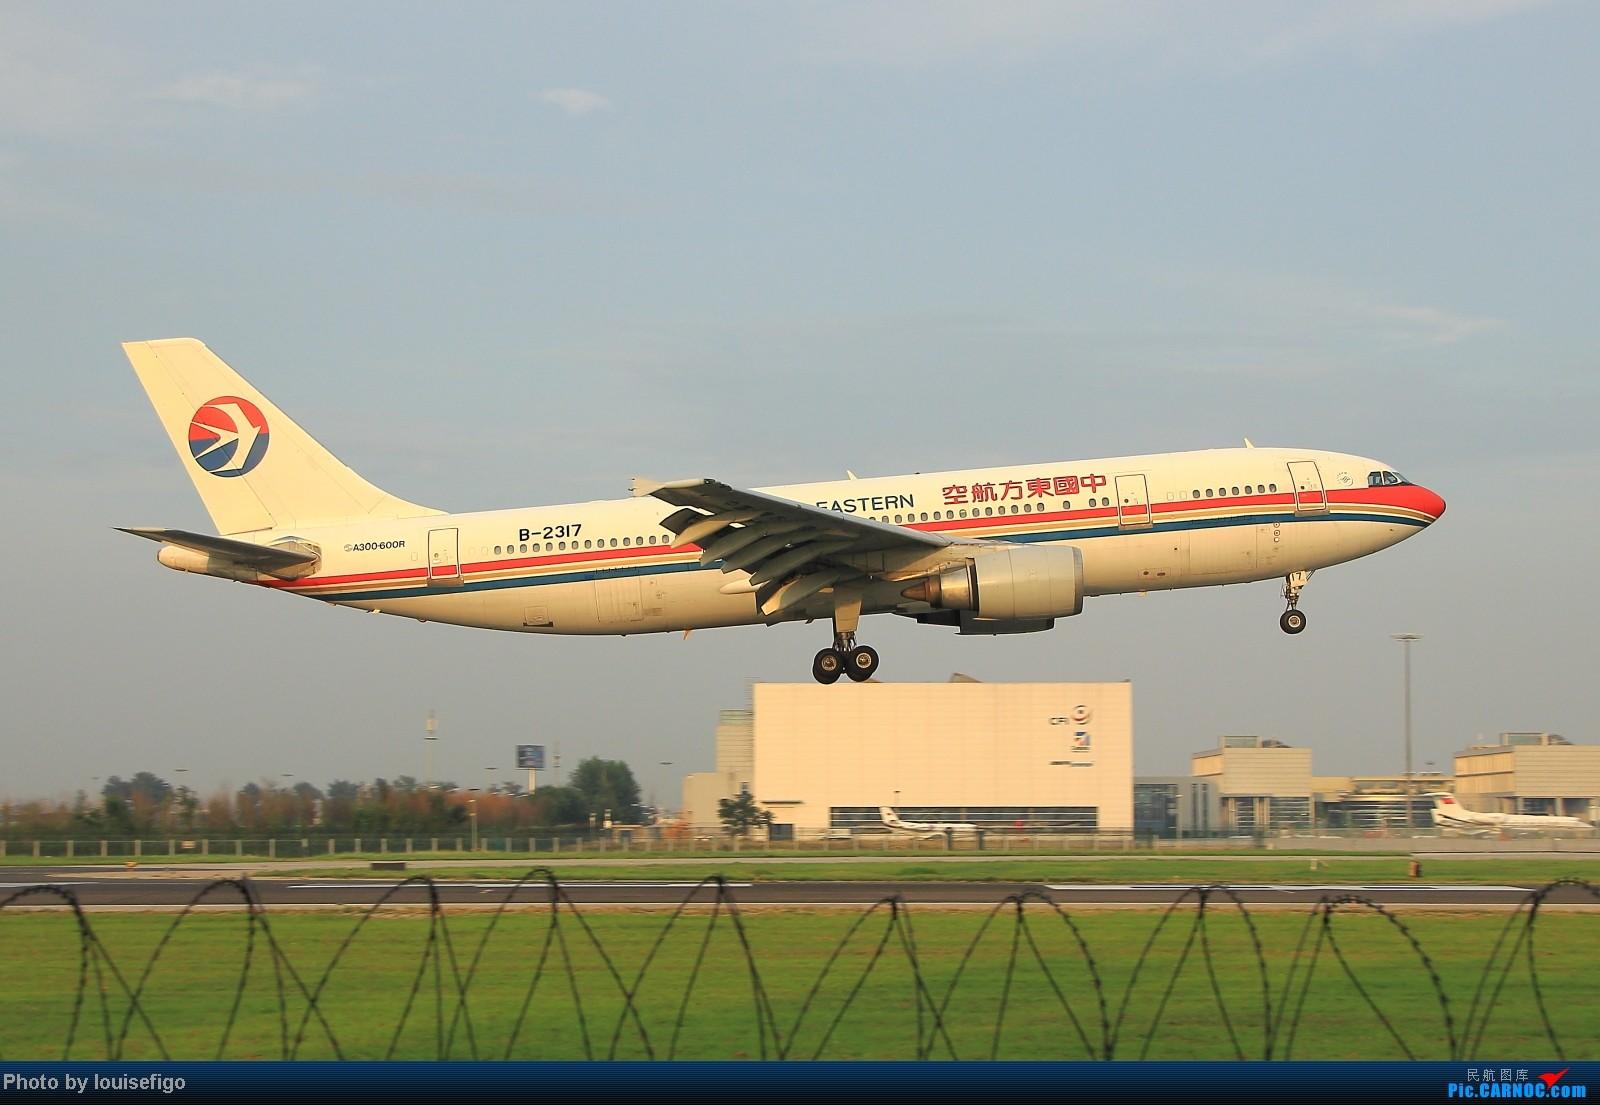 Re:[原创]闲来无事天气闷,发点冷饭自娱乐!!!PEK西跑的降落杂图~发到哪儿是哪儿啊!随心情! AIRBUS A300-B4-600R B-2317 北京首都国际机场